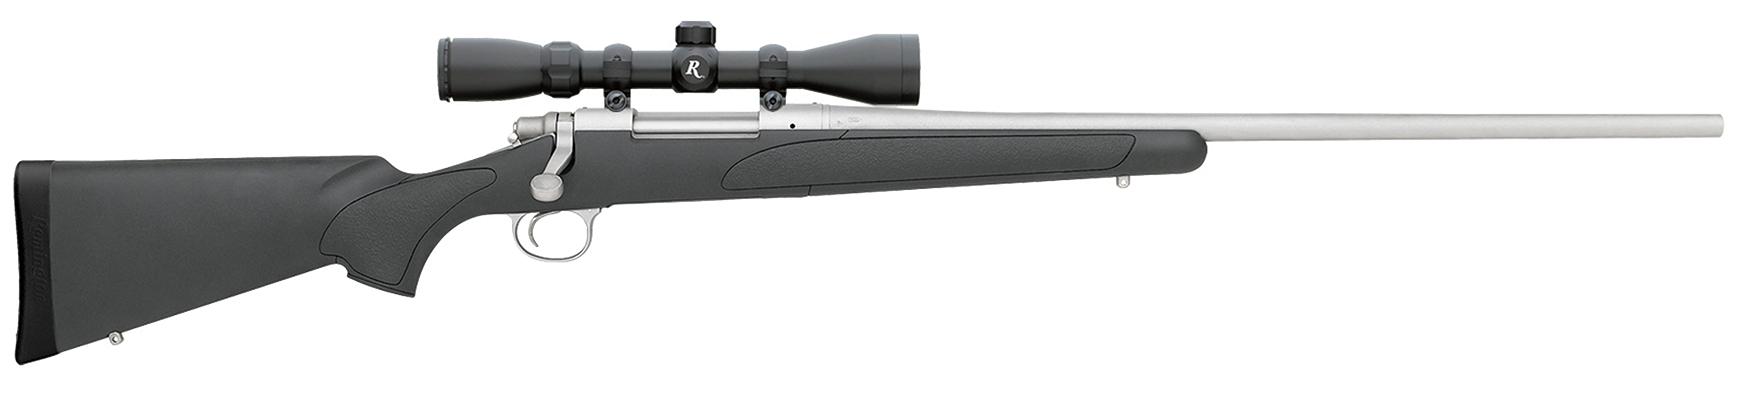 Remington 700 700 ADL-img-0